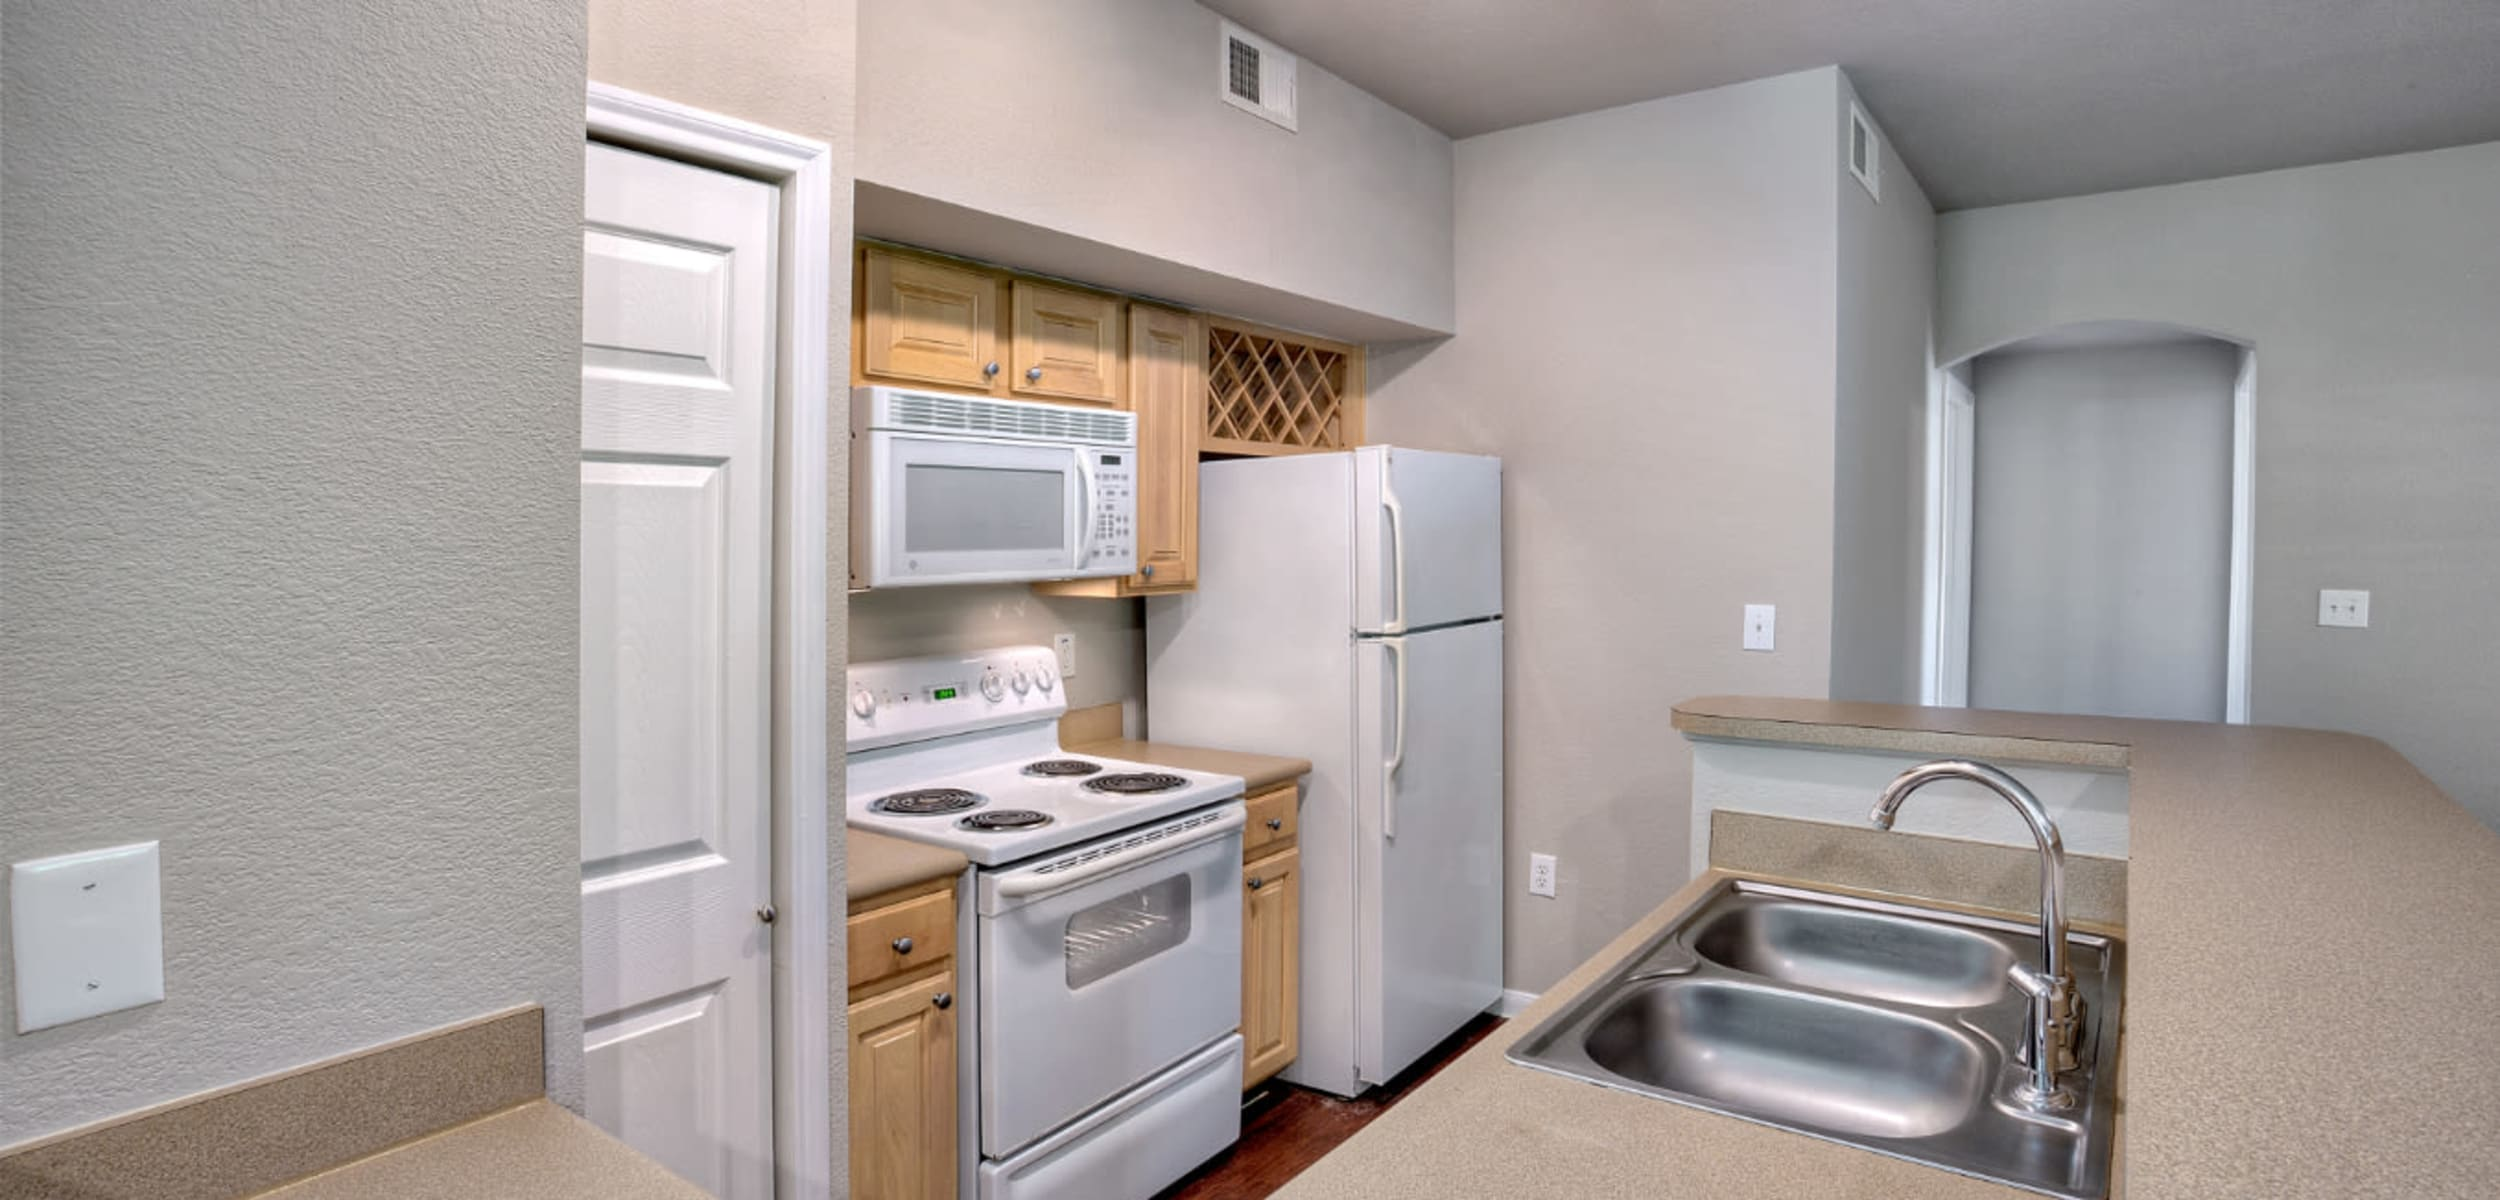 Modern, sleek kitchen at Marquis Bandera in San Antonio, Texas